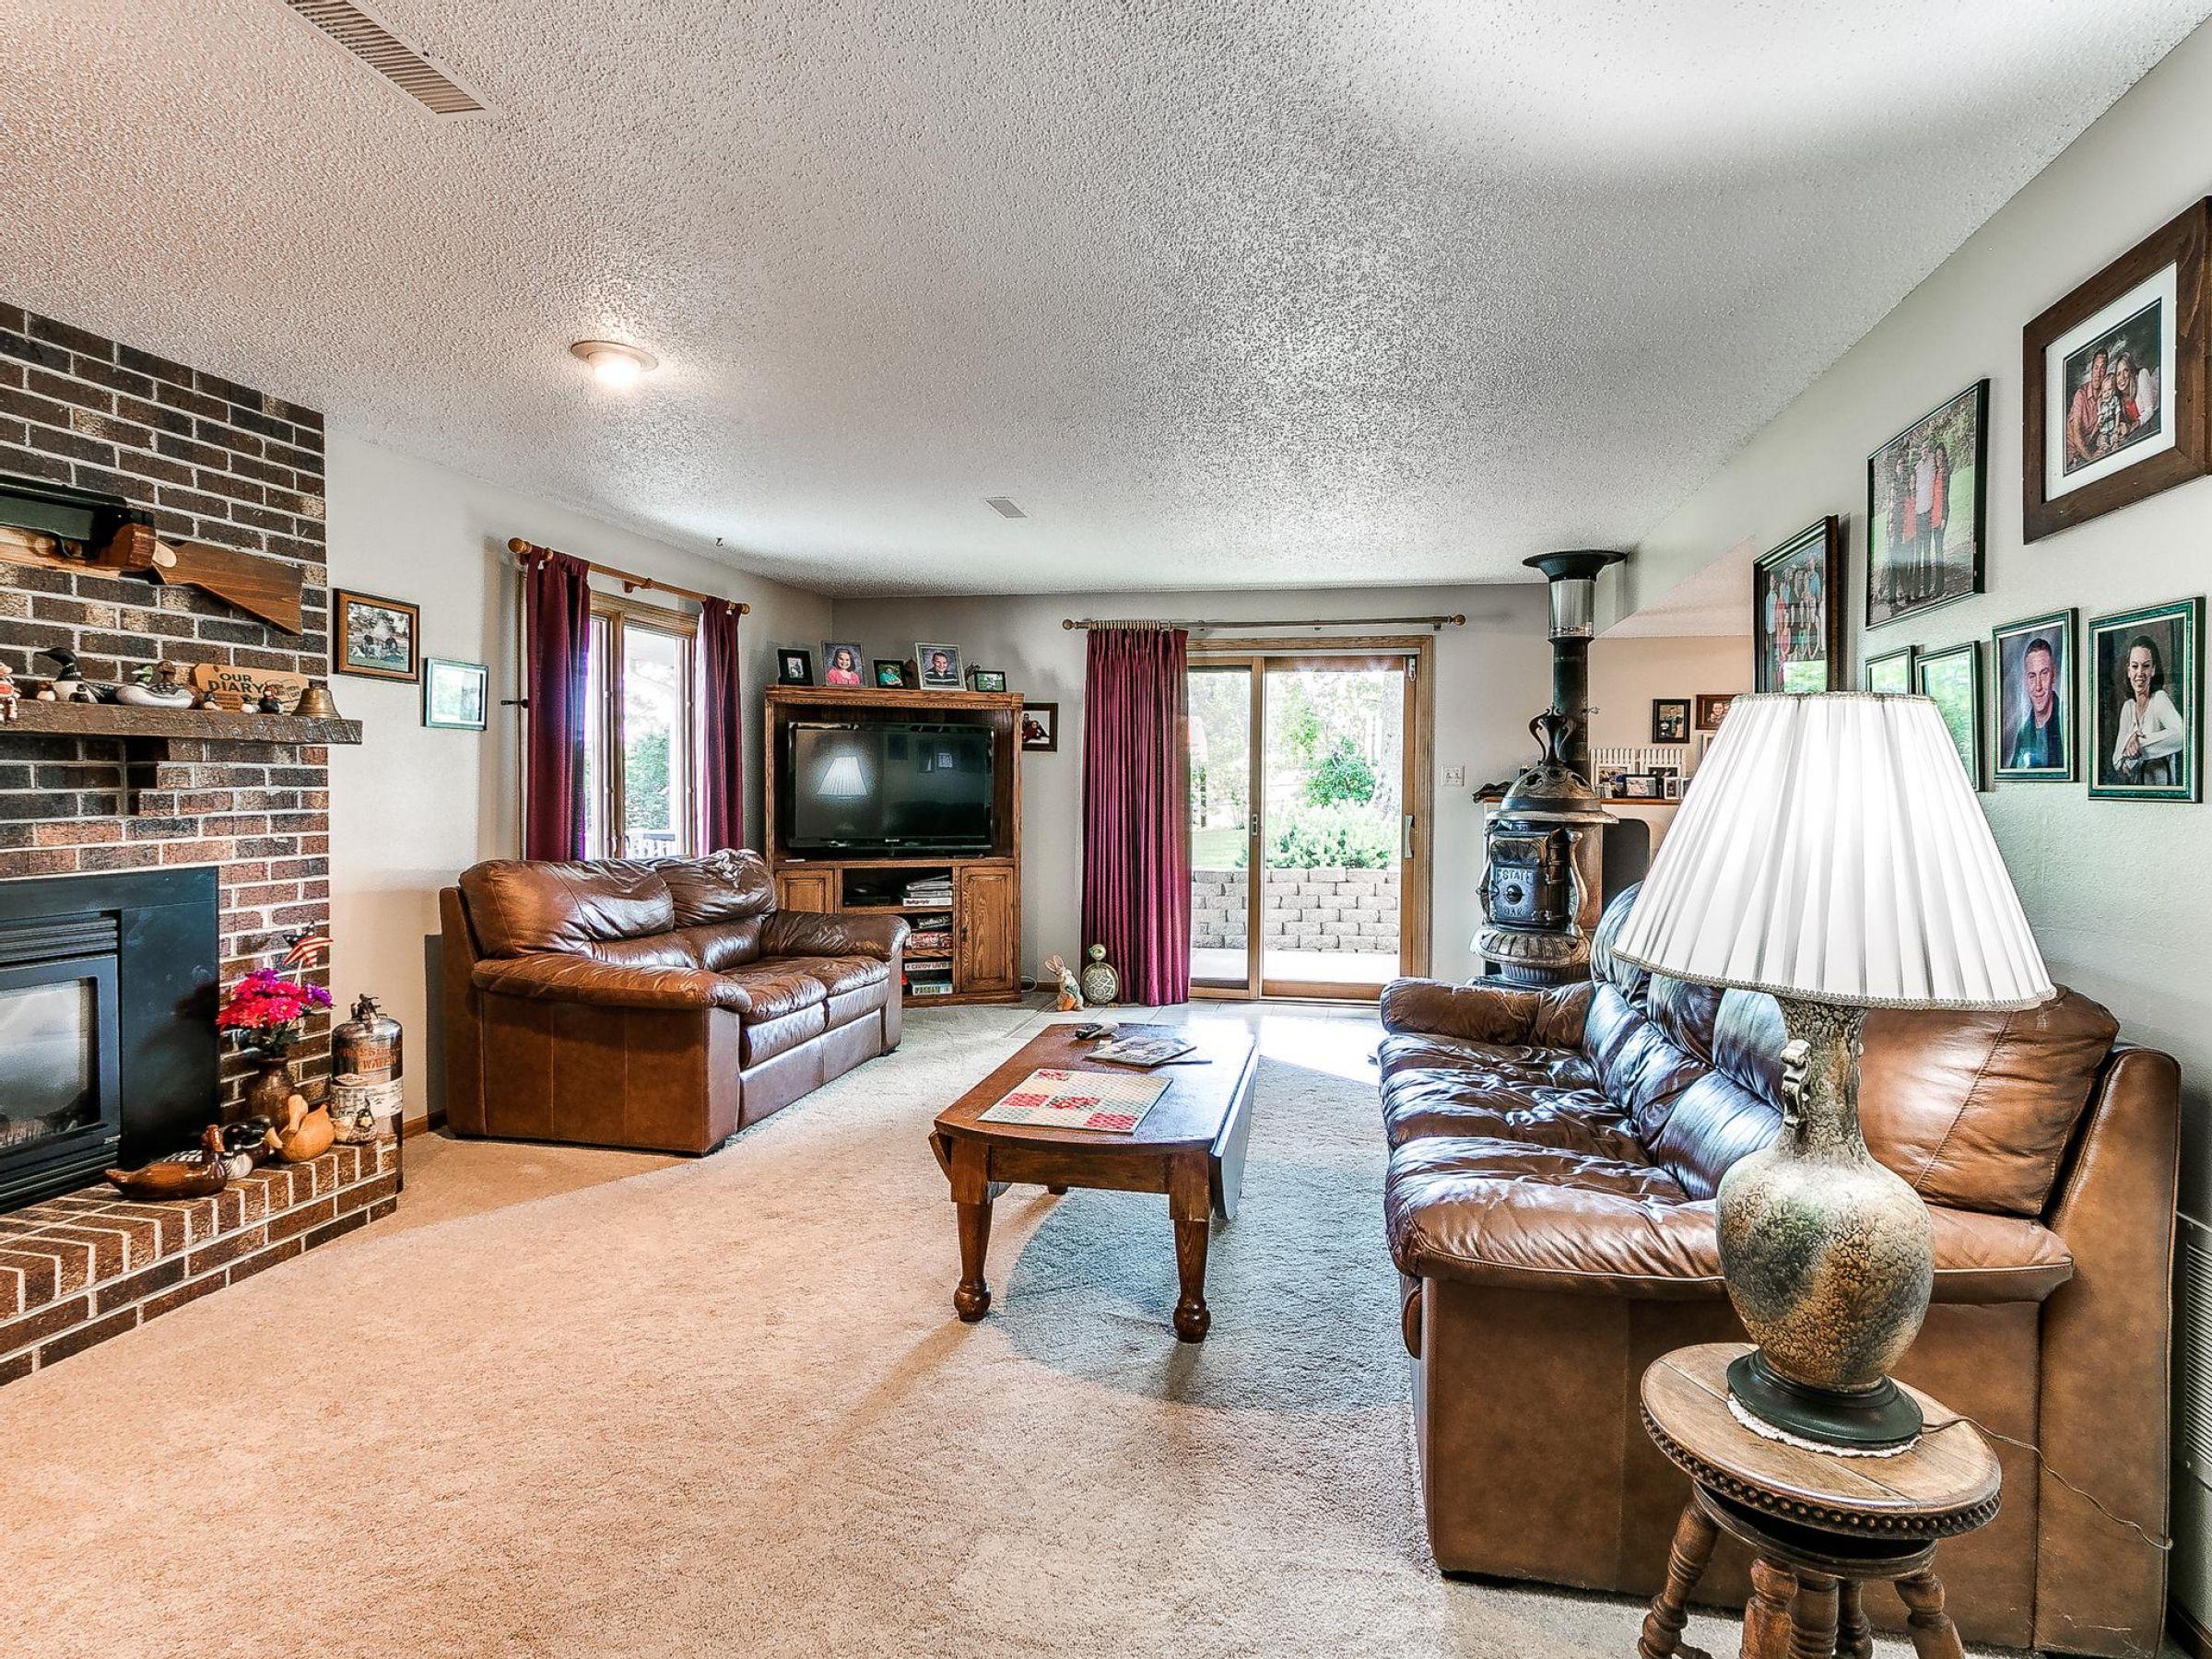 residential-warren-county-iowa-3-acres-listing-number-15593-3-2021-06-18-155239.jpg